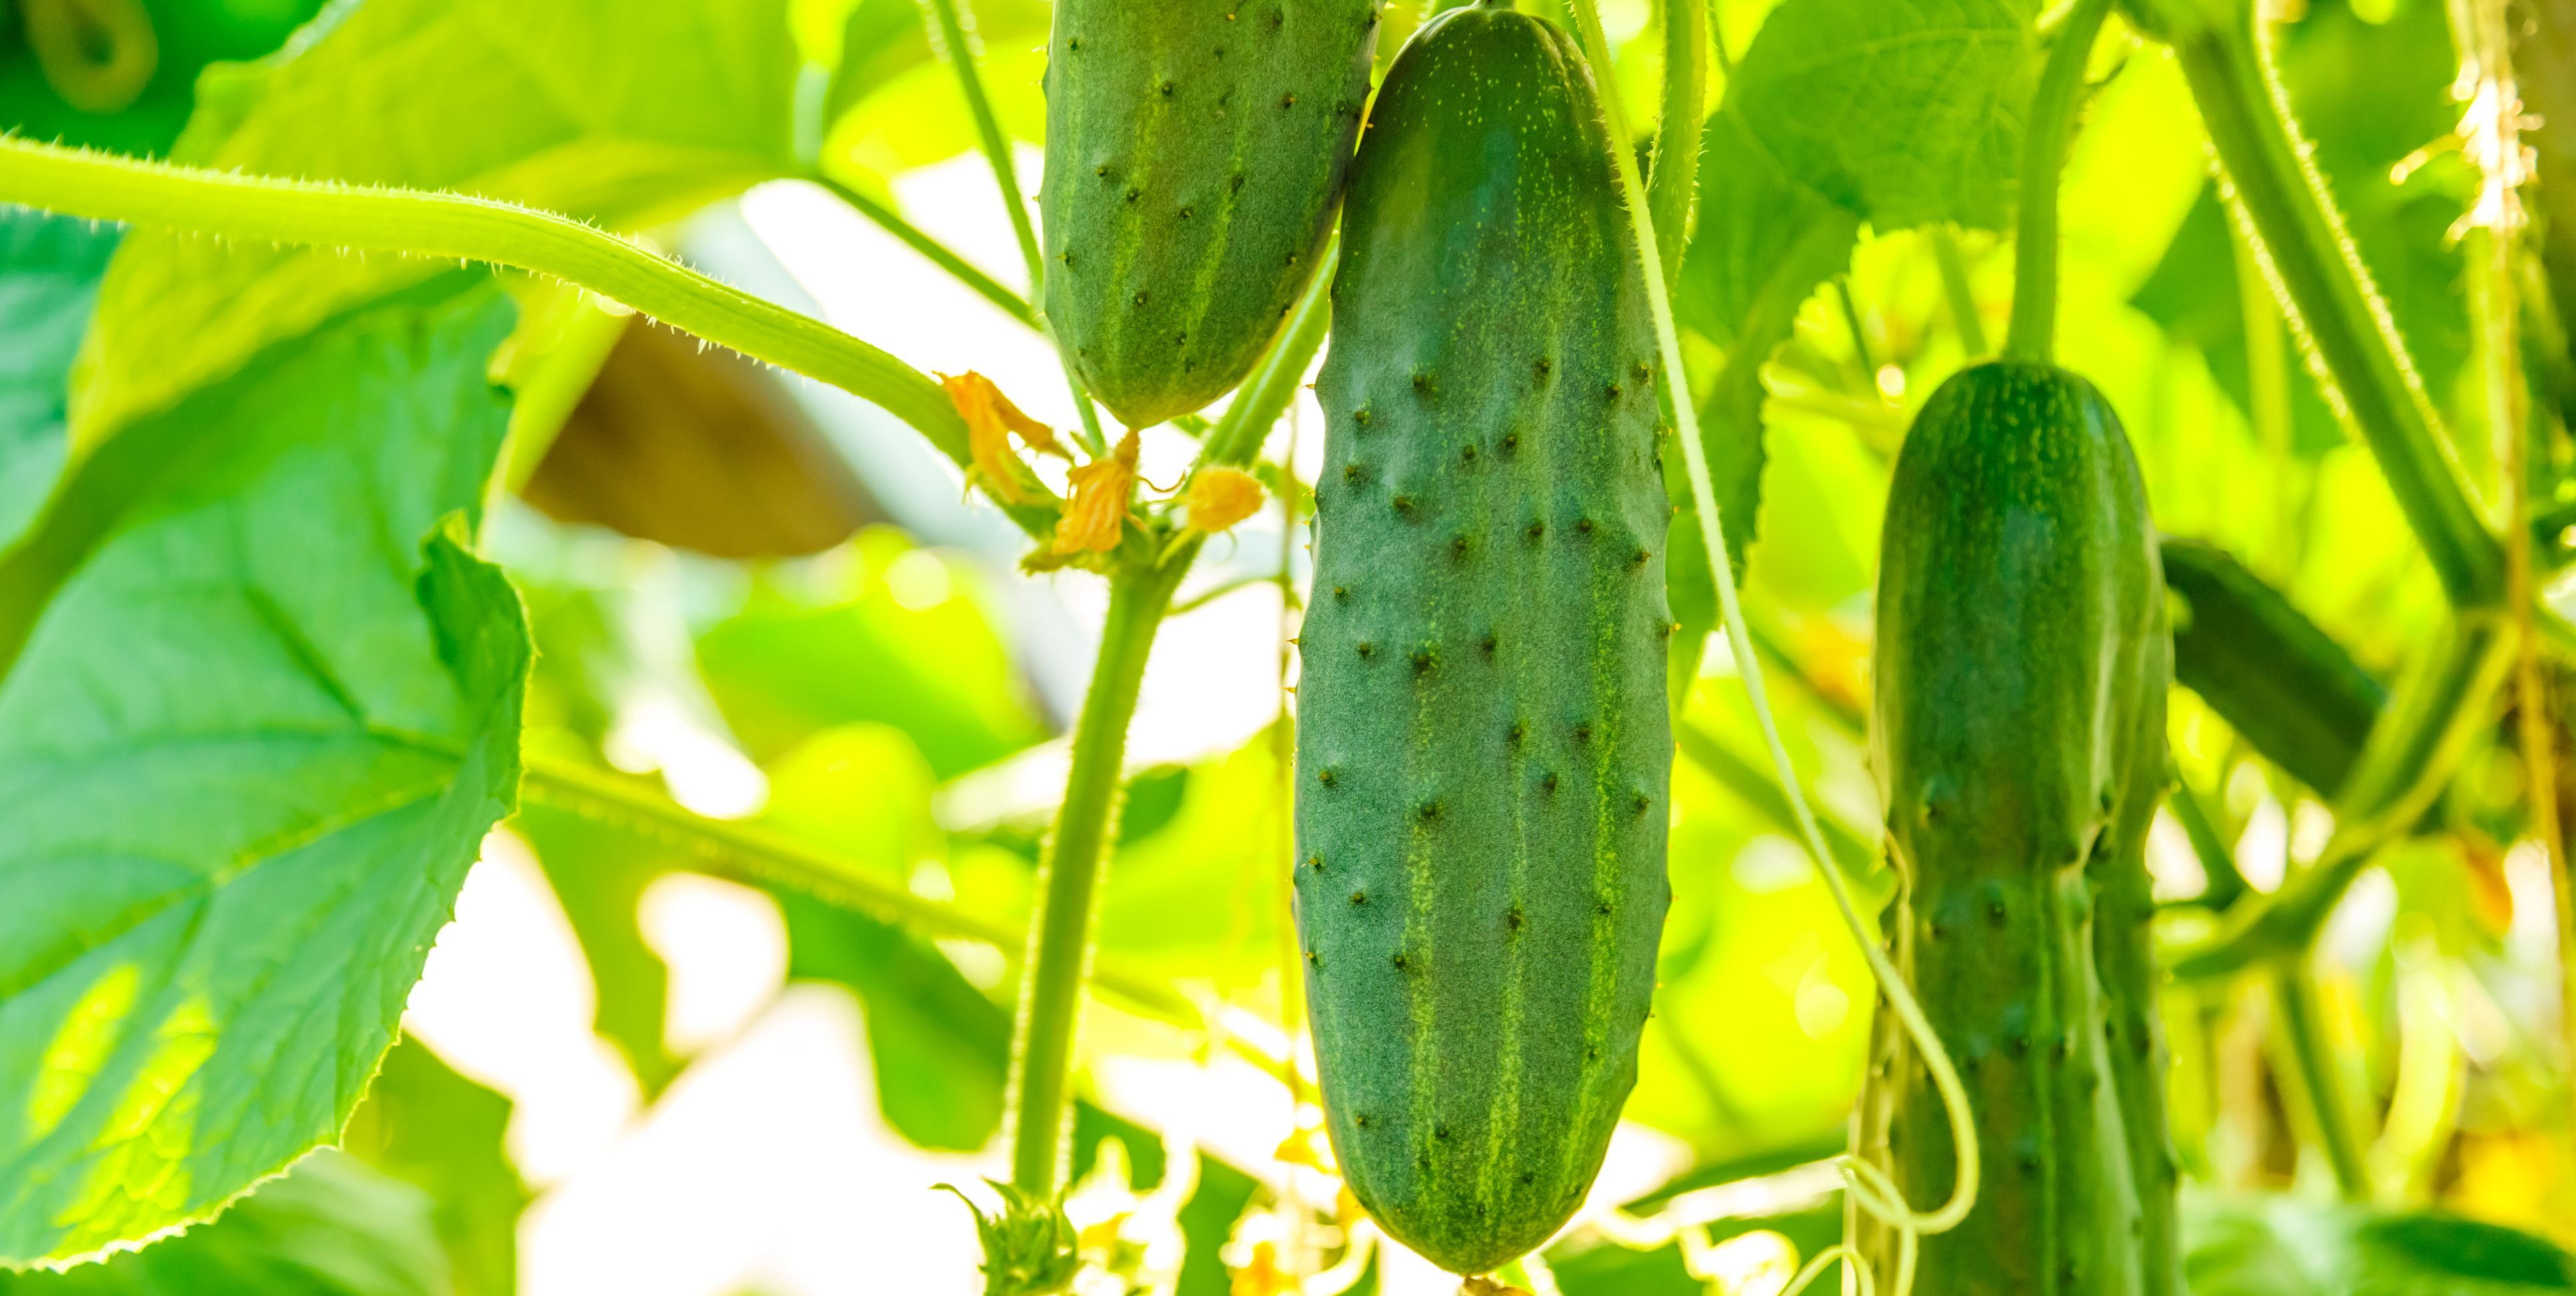 Fresh ripe cucumbers growing in greenhouse